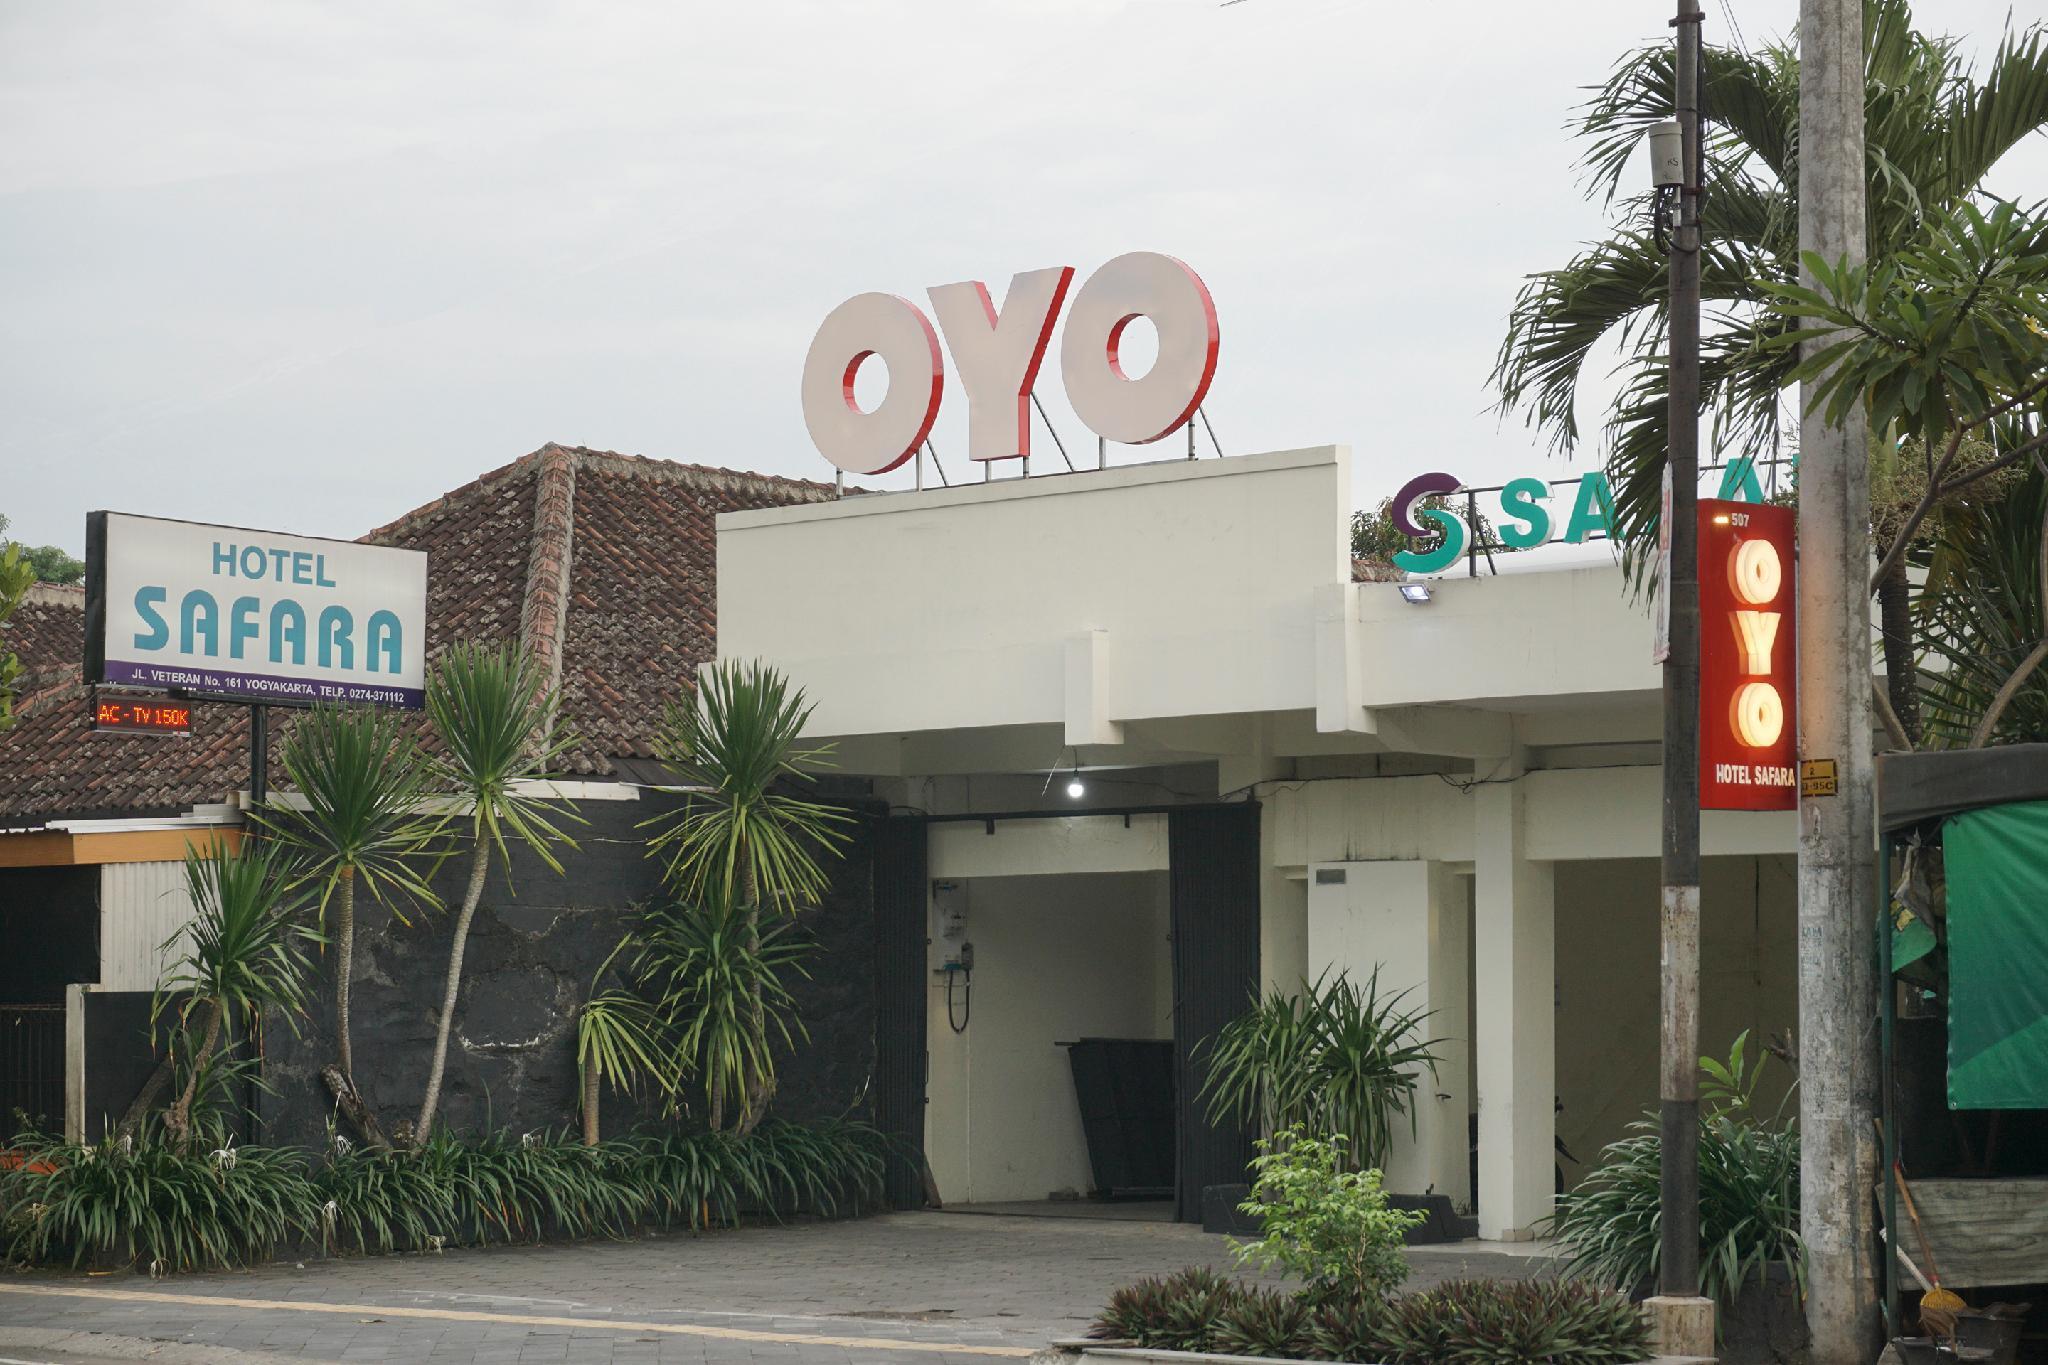 OYO 693 Hotel Safara